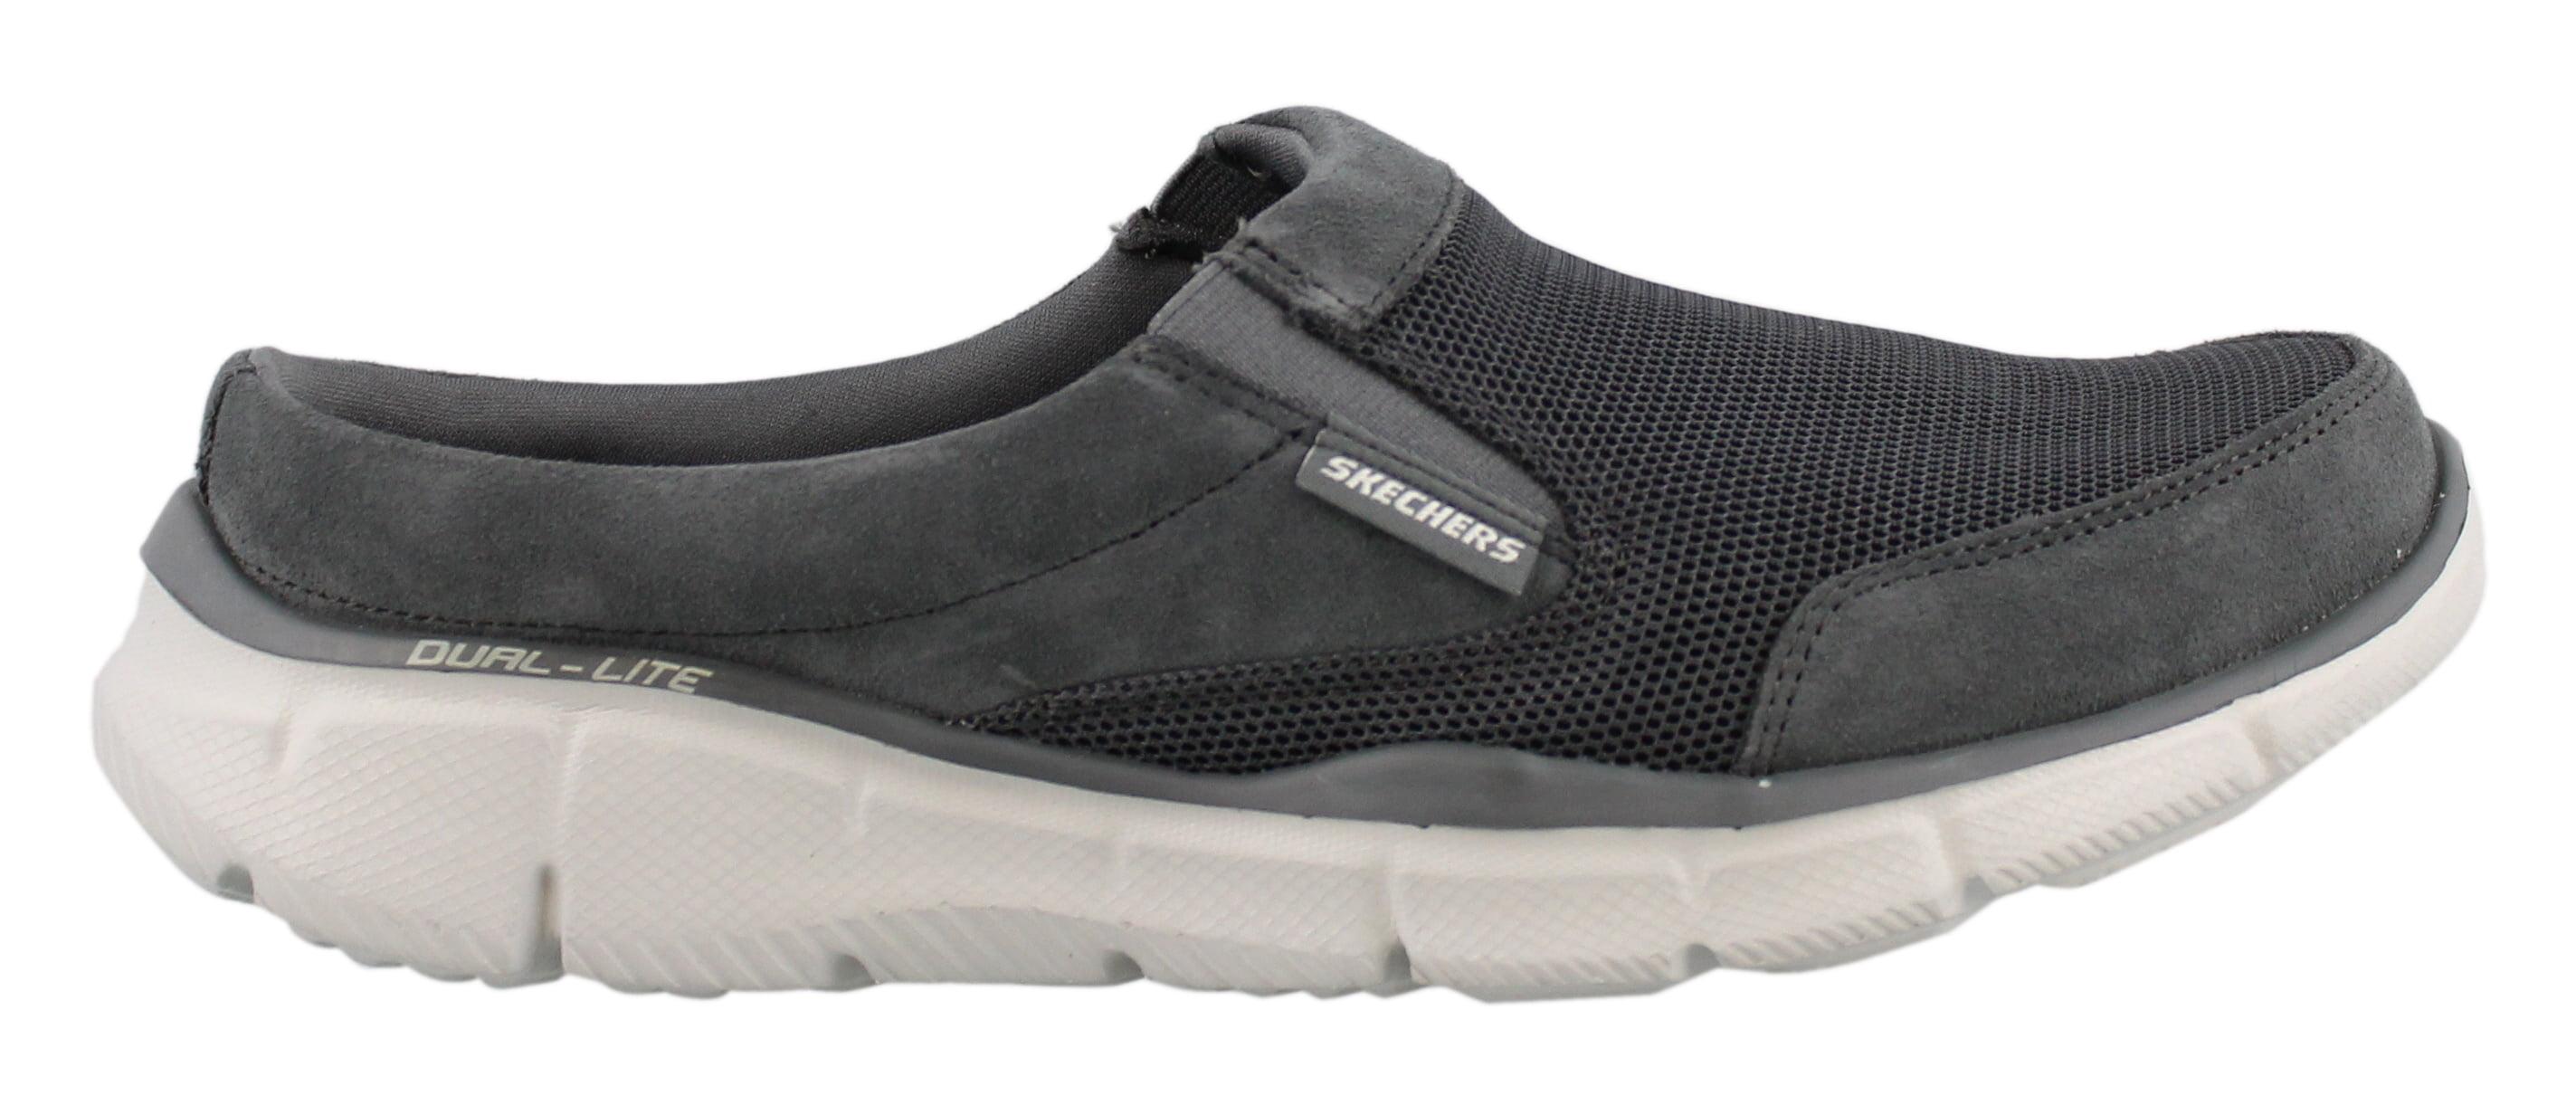 Men's Skechers, Equalizer Coast To Coast Slip on Shoe by Skechers